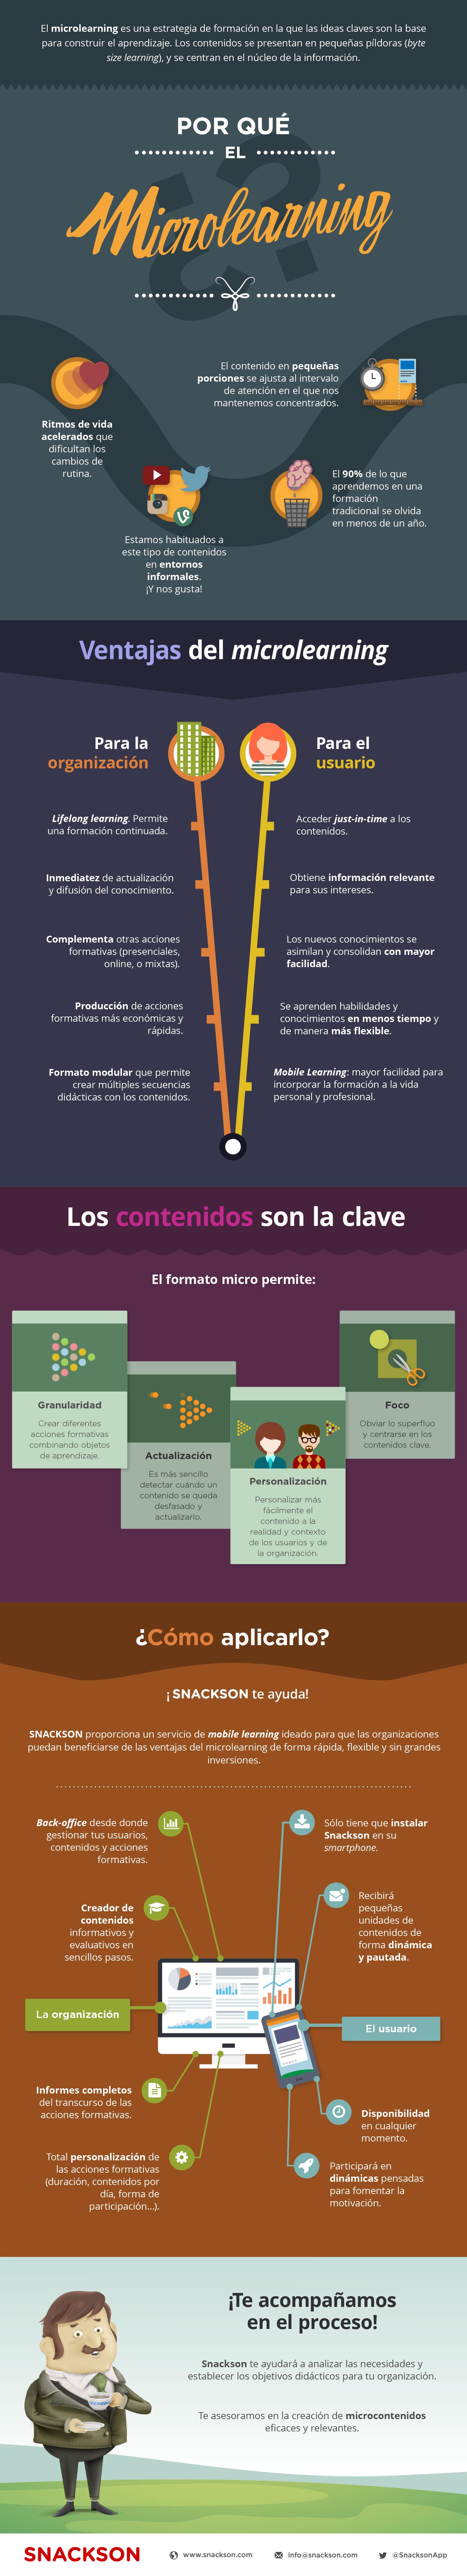 Infografía microlearning Snackson